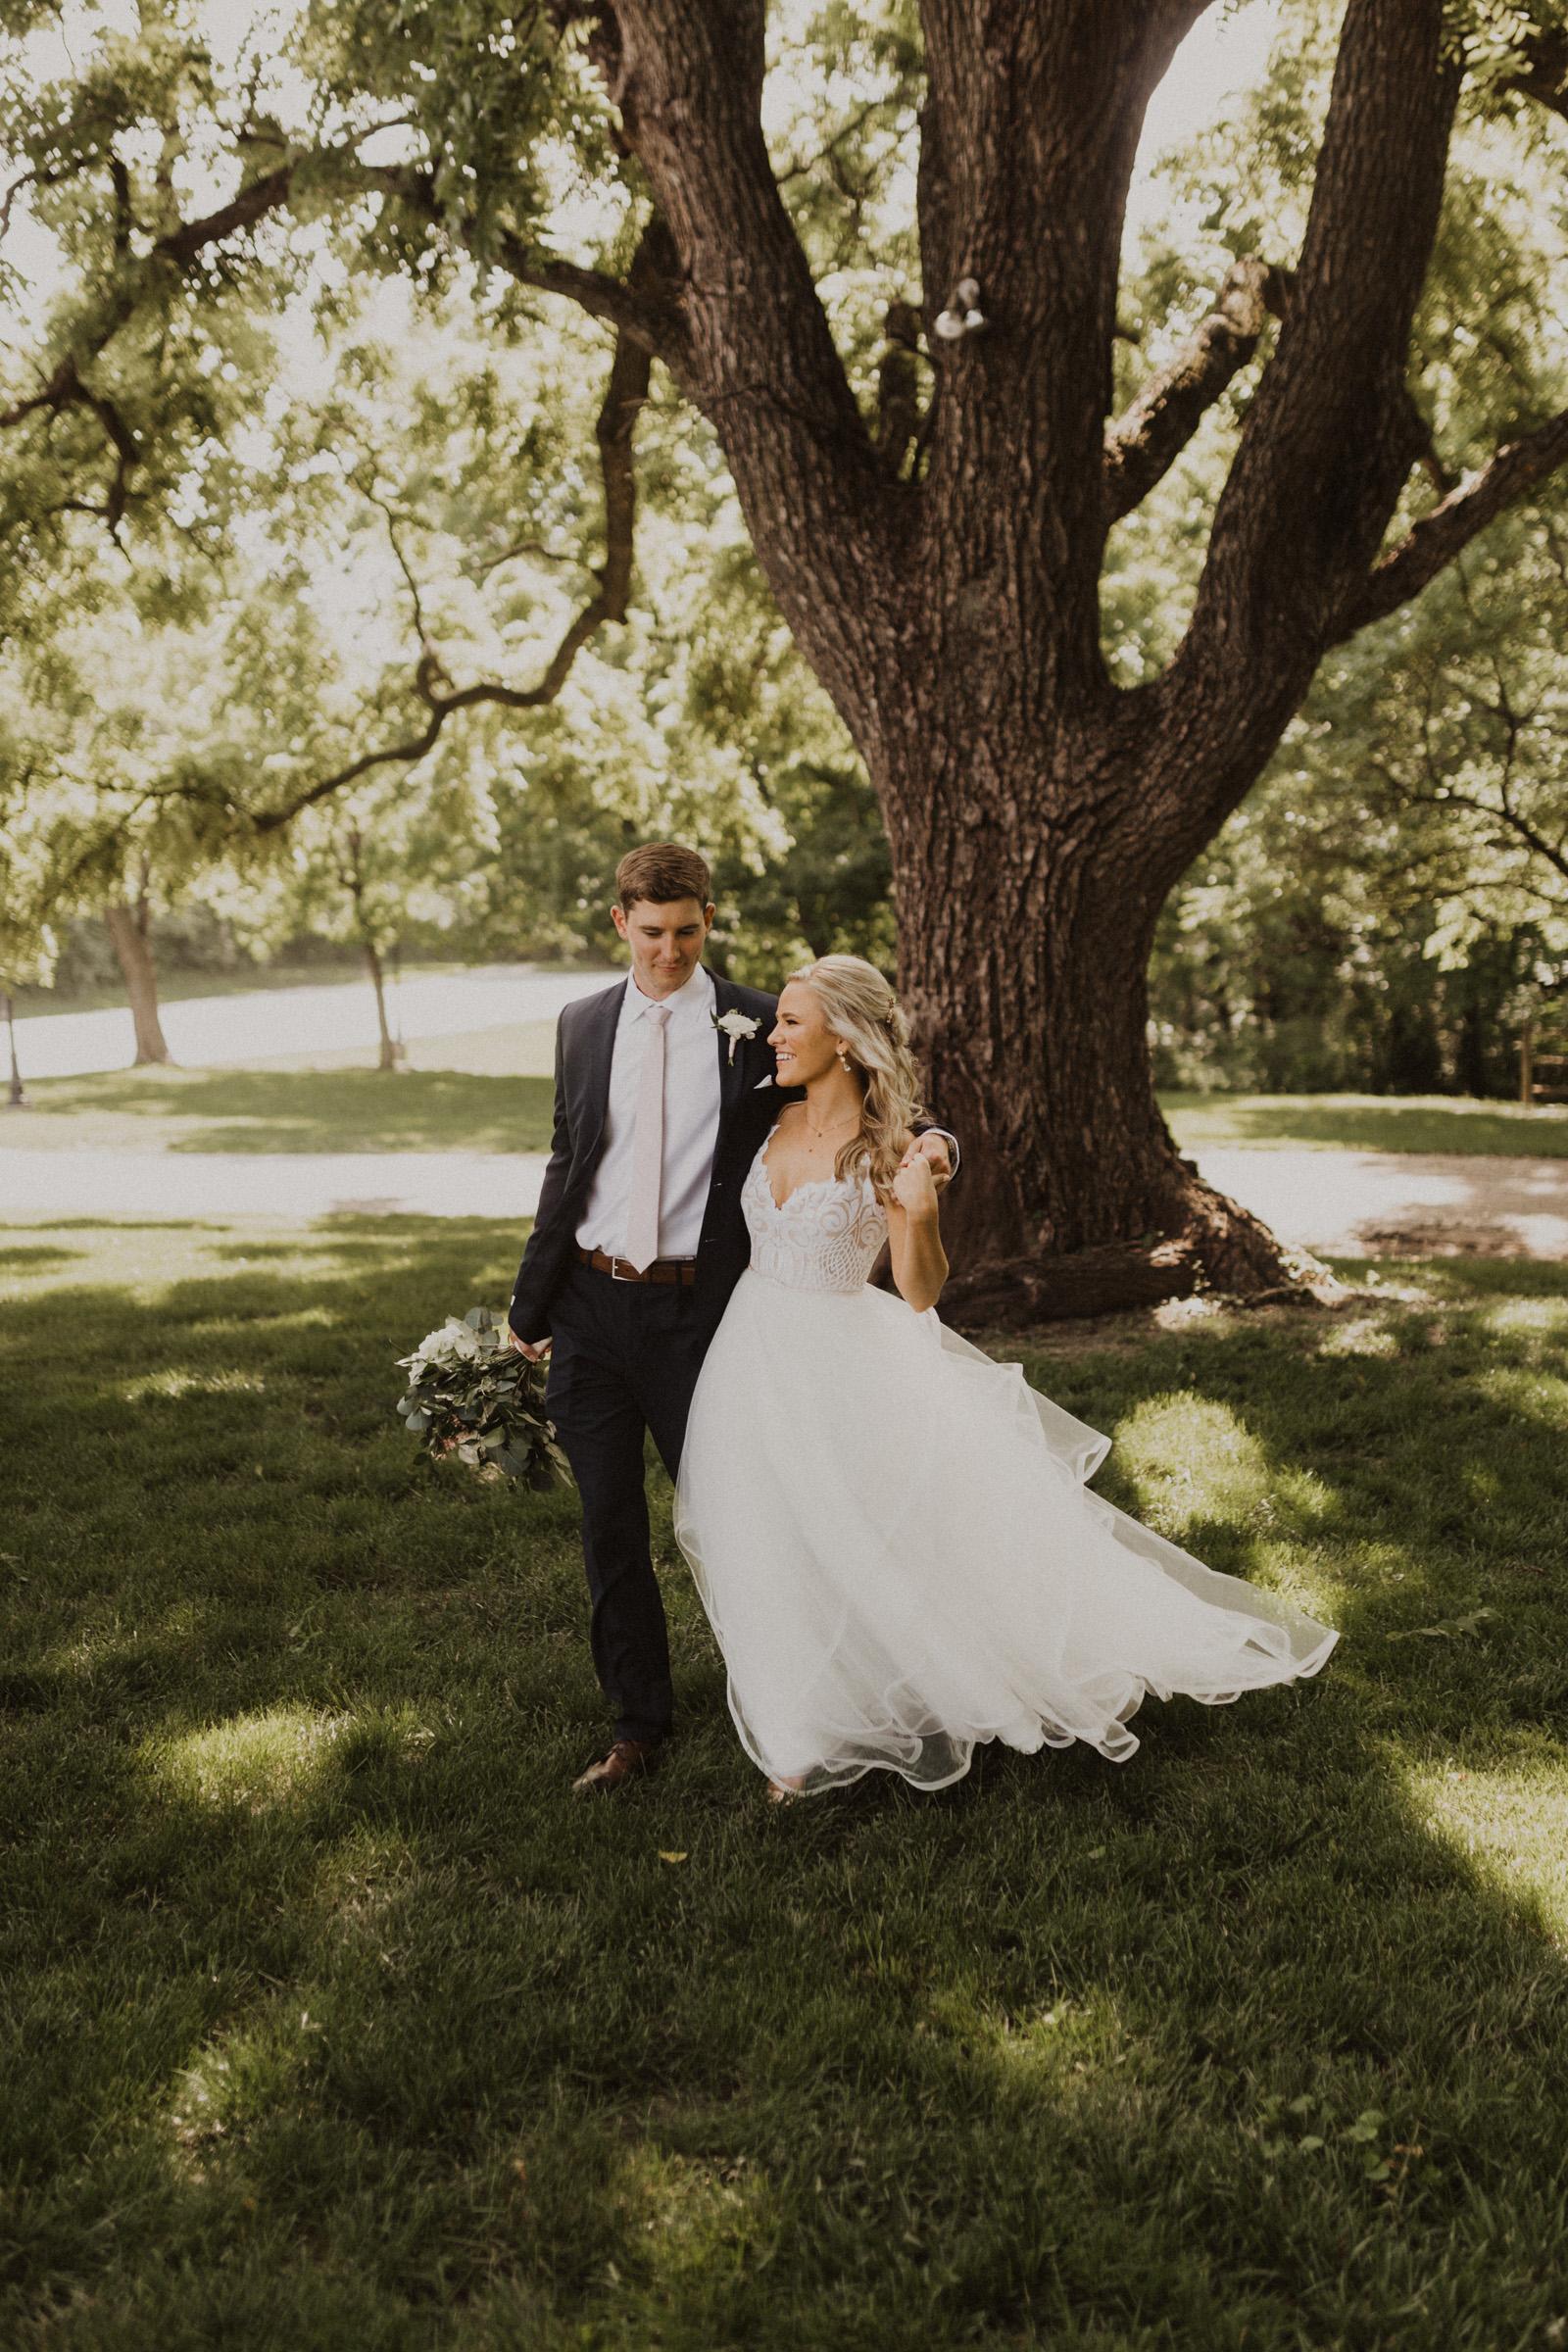 alyssa barletter photography hawthorne house summer outdoor wedding southern charm inspiration-38.jpg